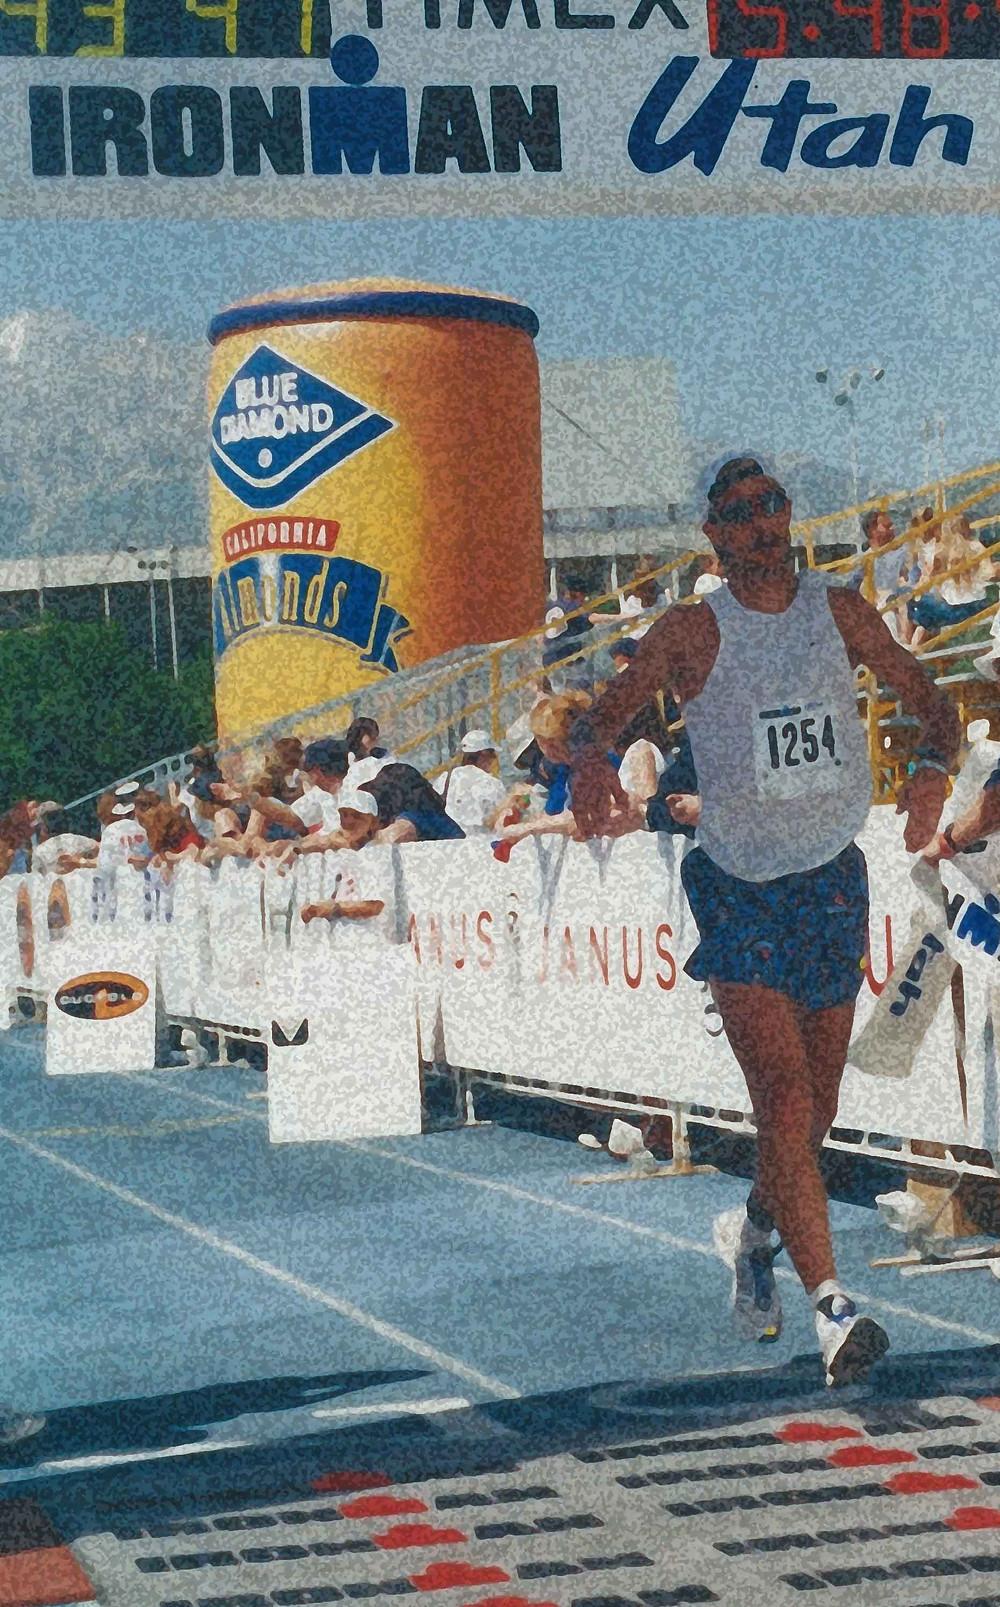 Ironman Utah triathlon Rug Leg